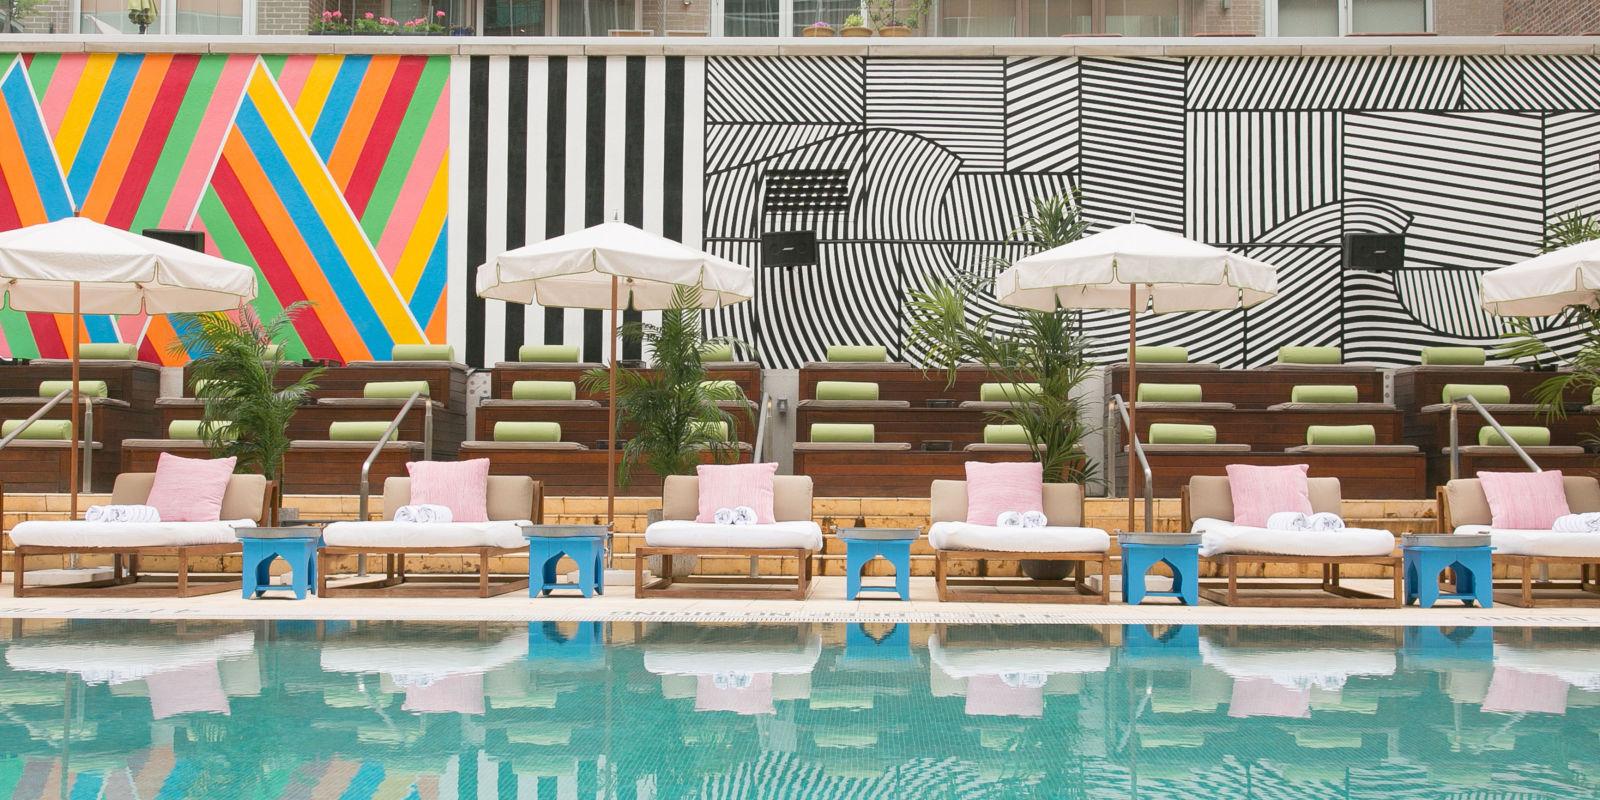 williamsburg brooklyn guide hotels restaurants and. Black Bedroom Furniture Sets. Home Design Ideas